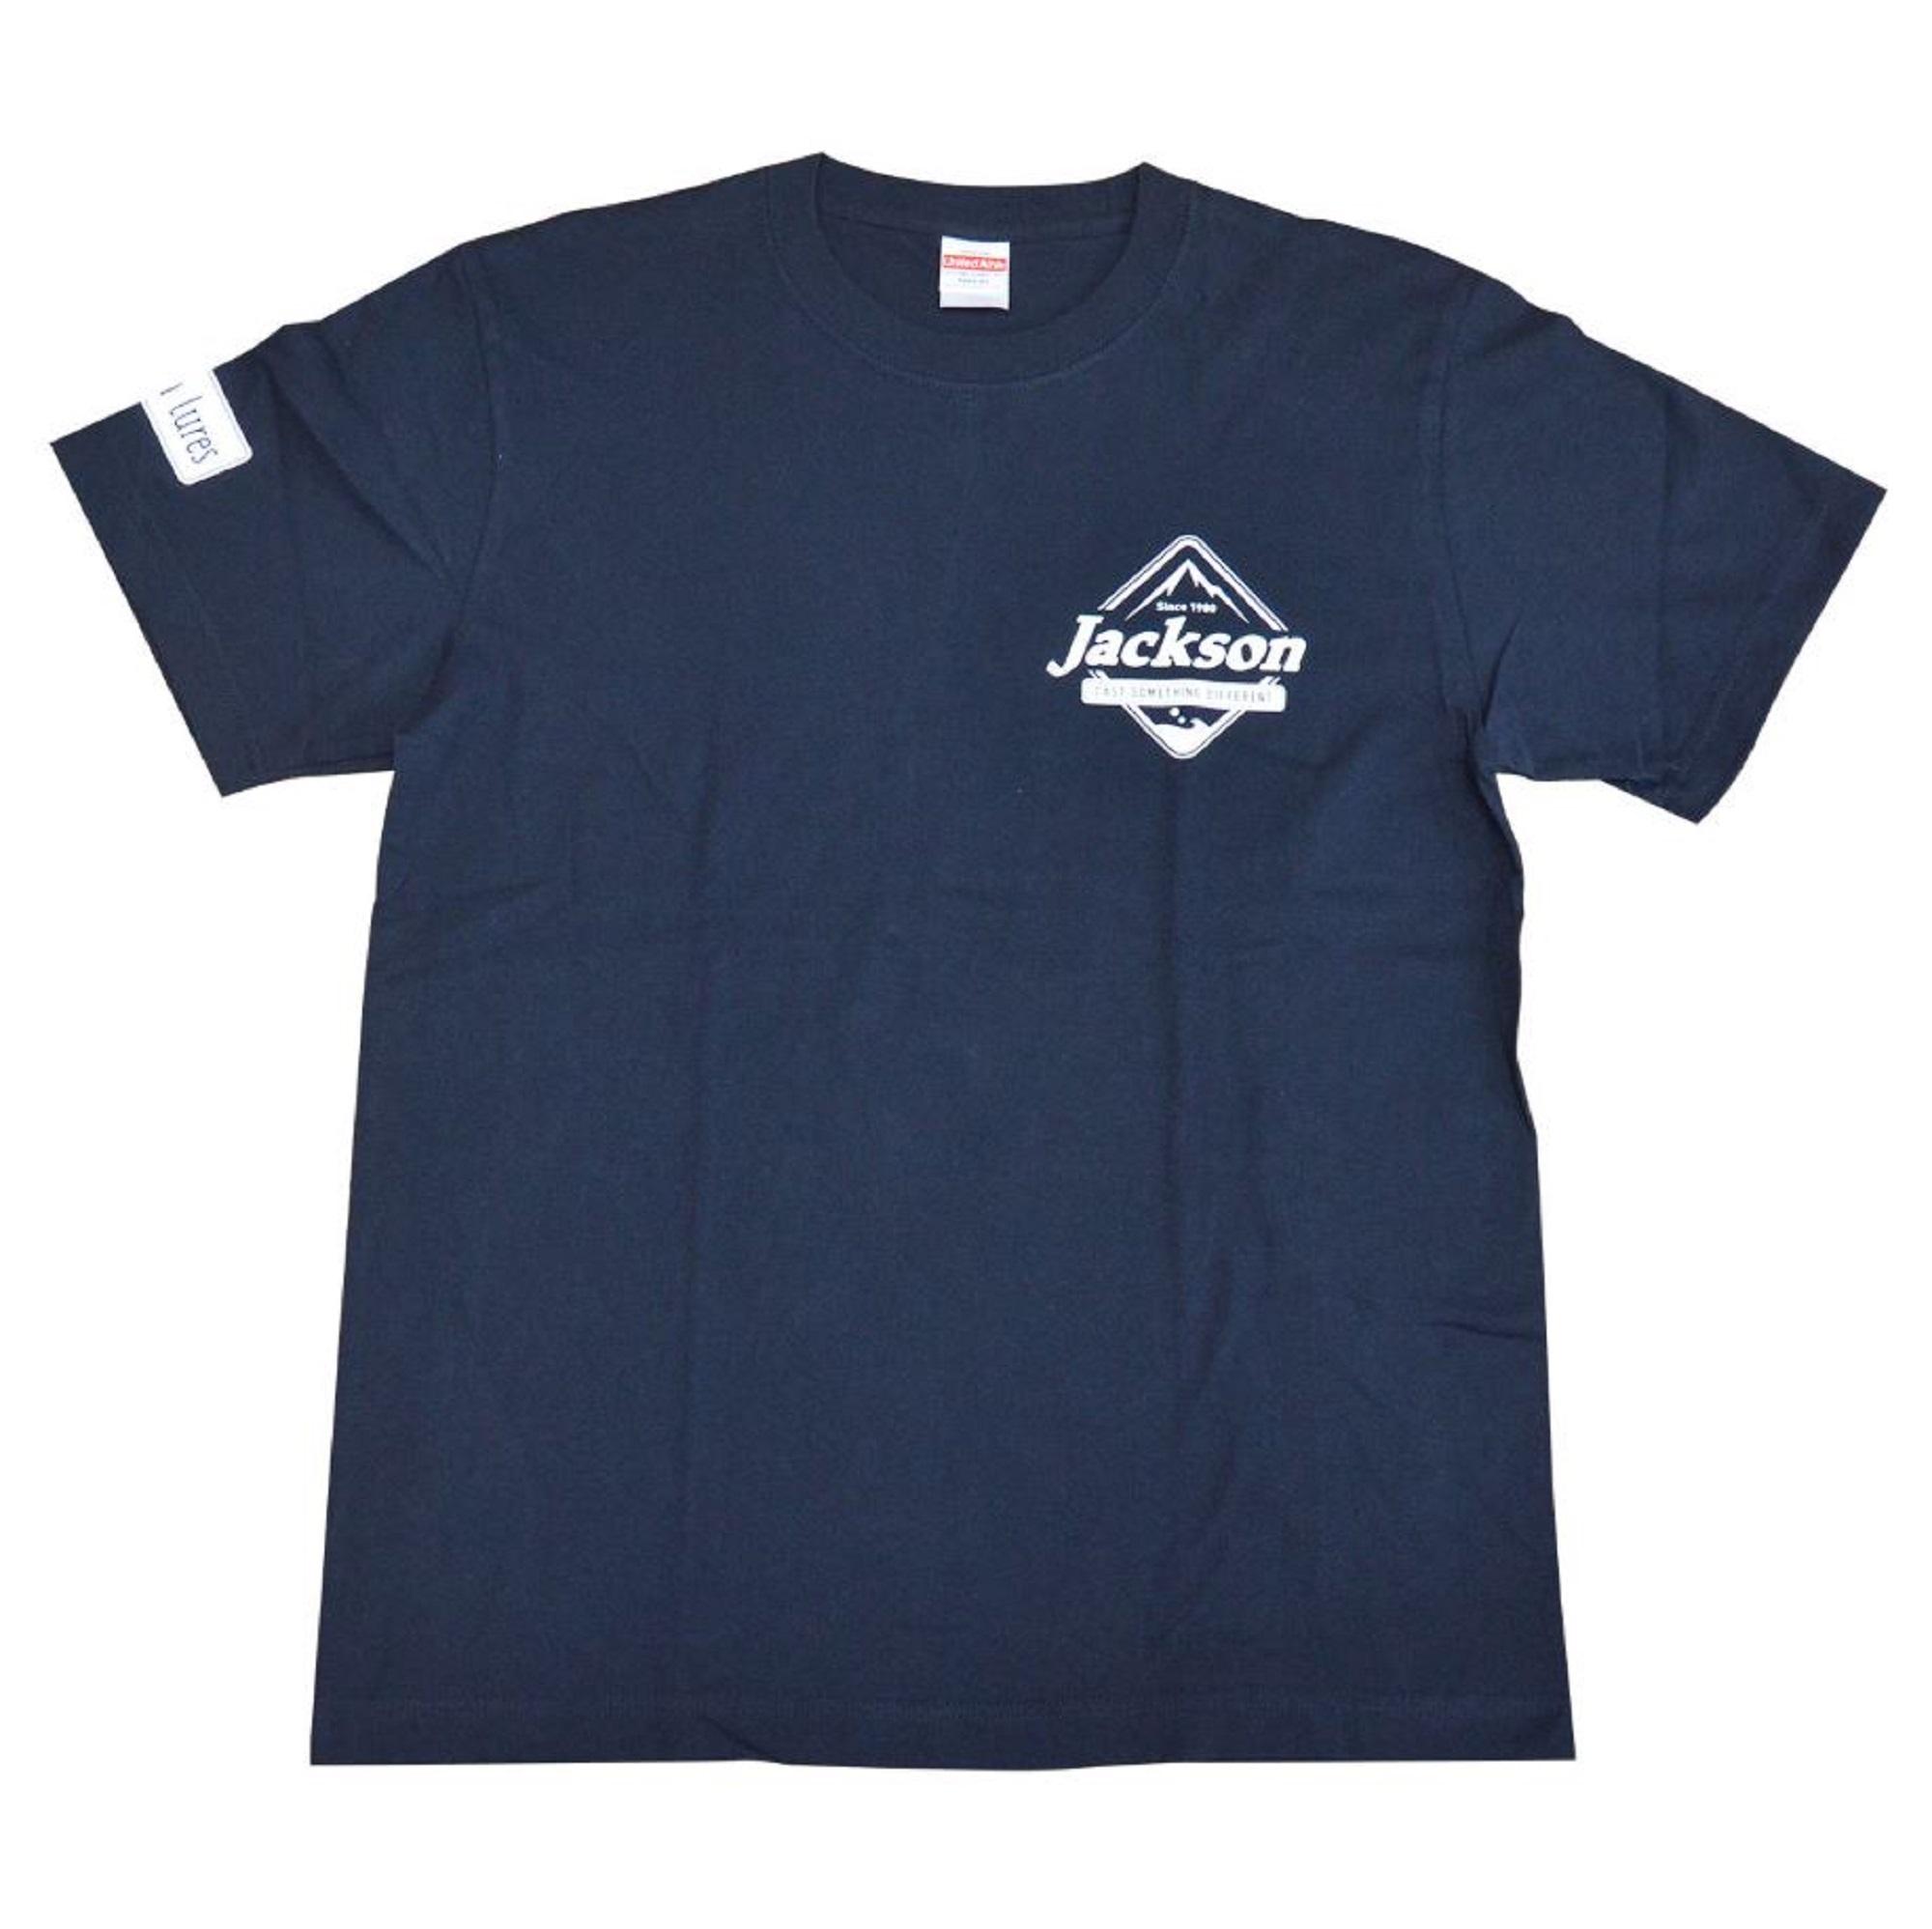 Jackson T-shirt Logo Tee Navy XL (9069)